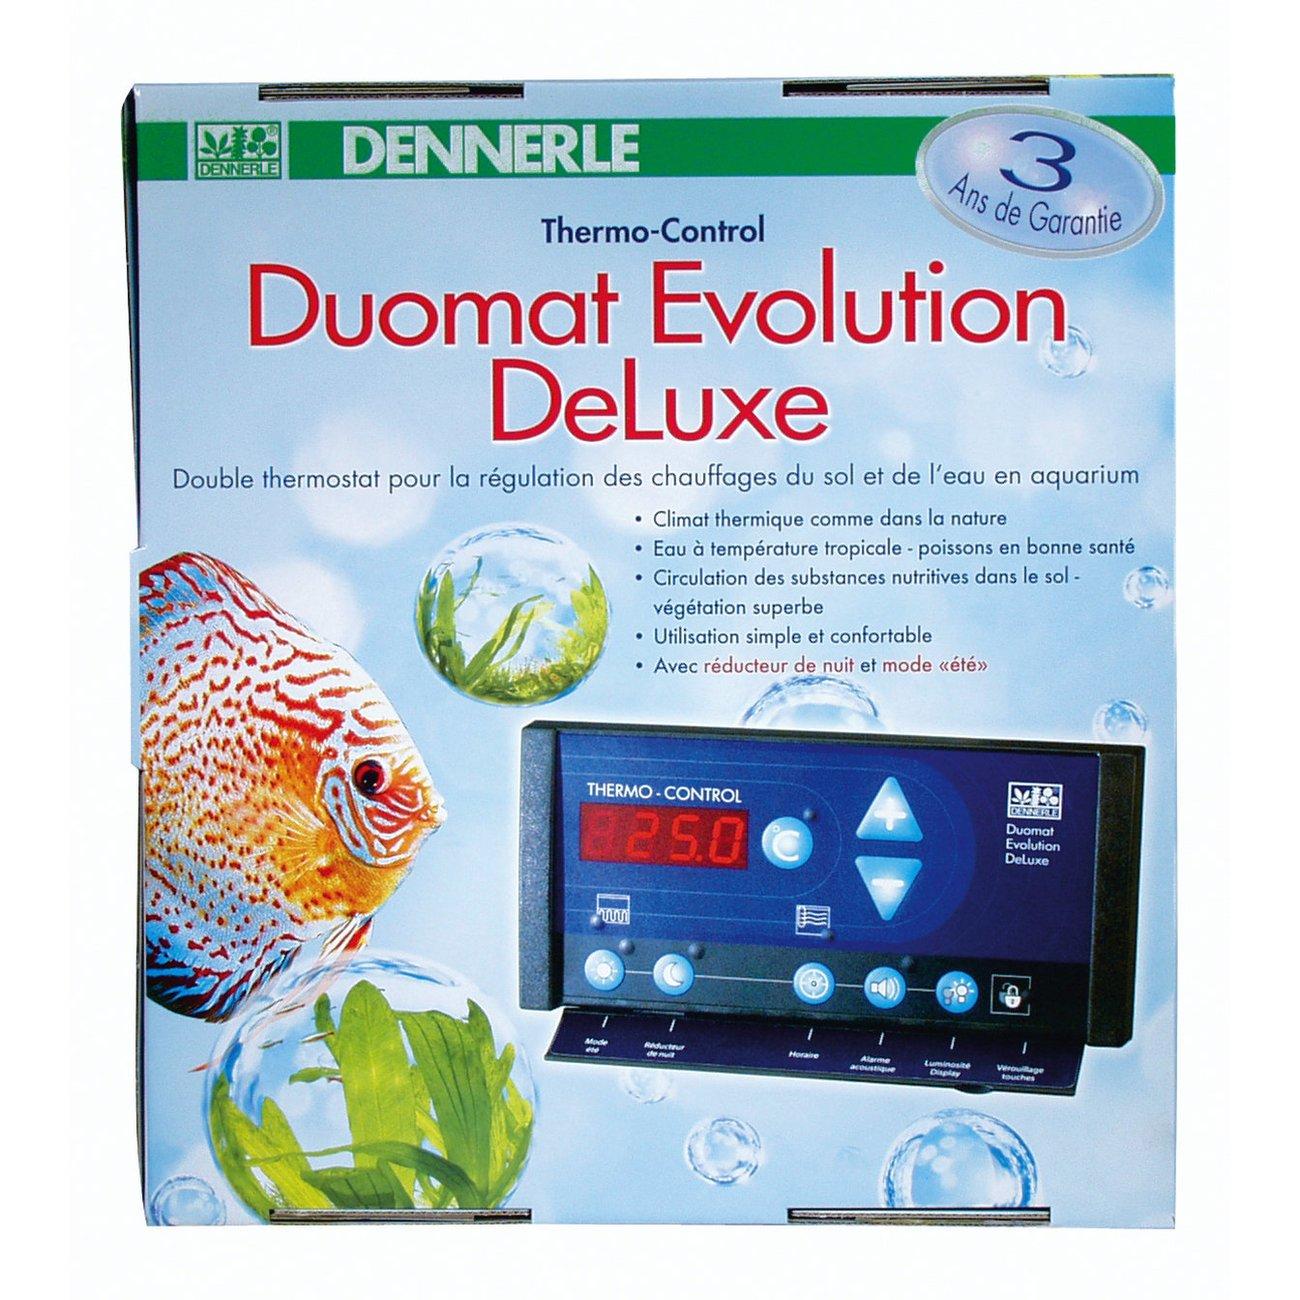 Dennerle DUOMAT Evolution DeLuxe, Heizungssteuerung